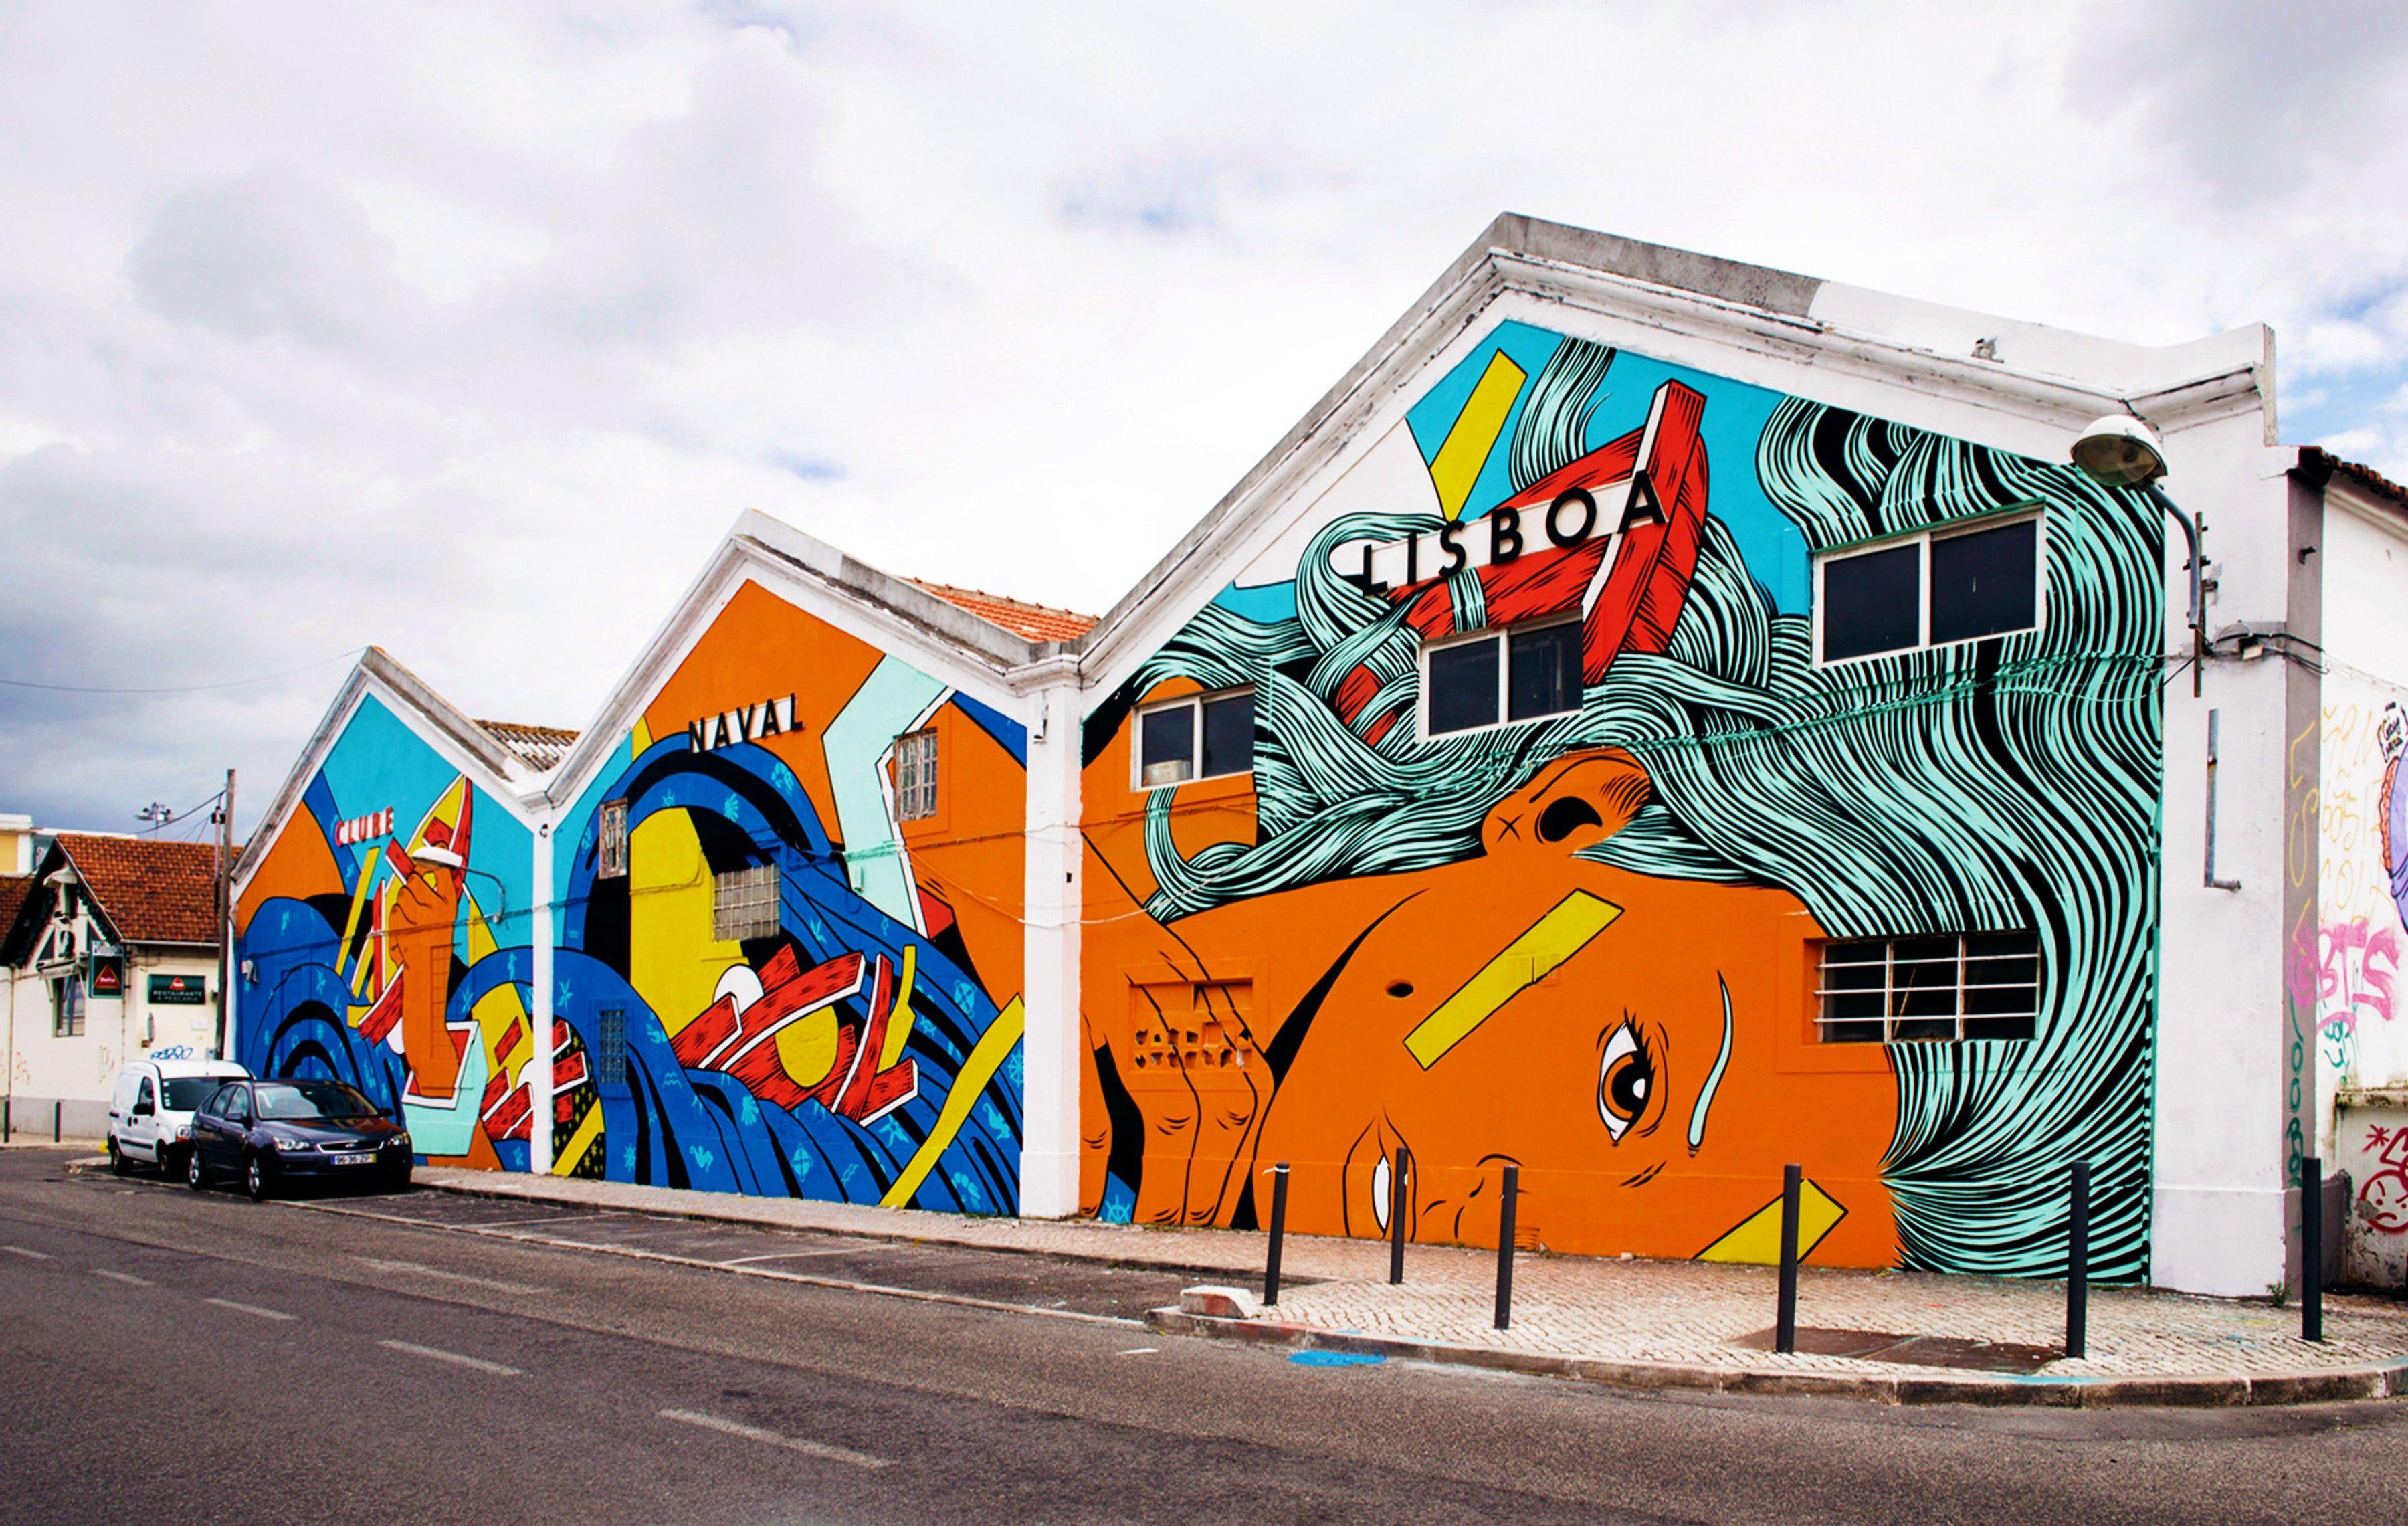 Urban Art in Lisboa 4: downhill, towards the river